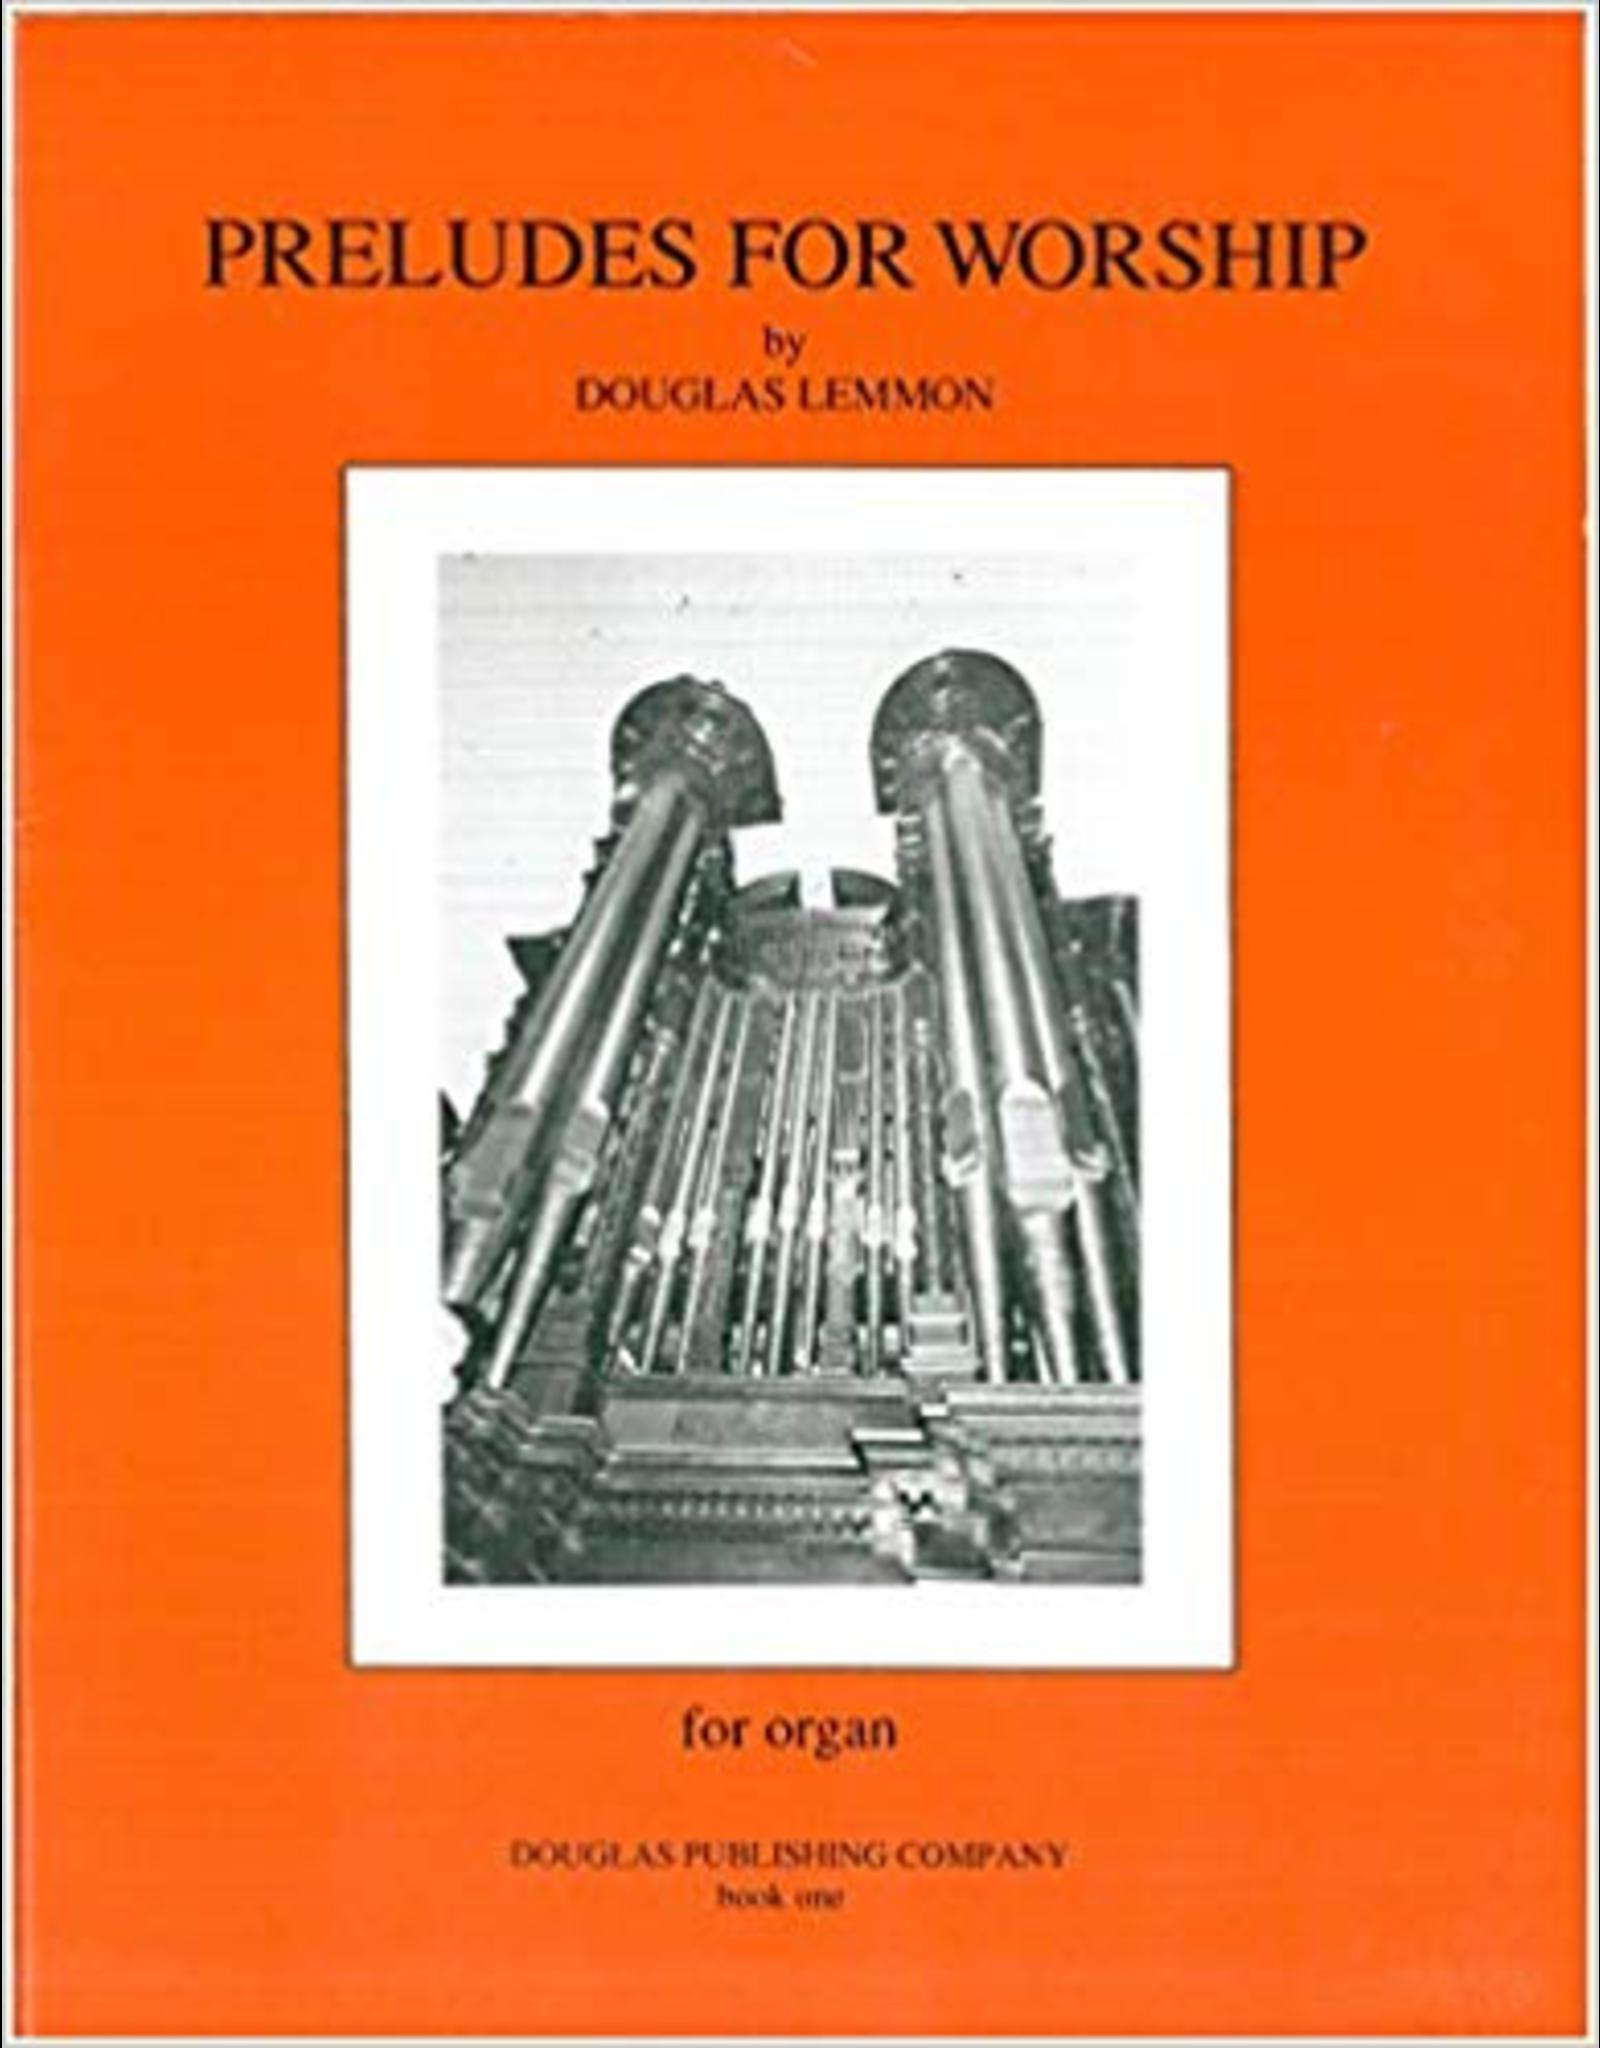 Douglas Publishing Company Preludes for Worship Book 1 Douglas Lemmon